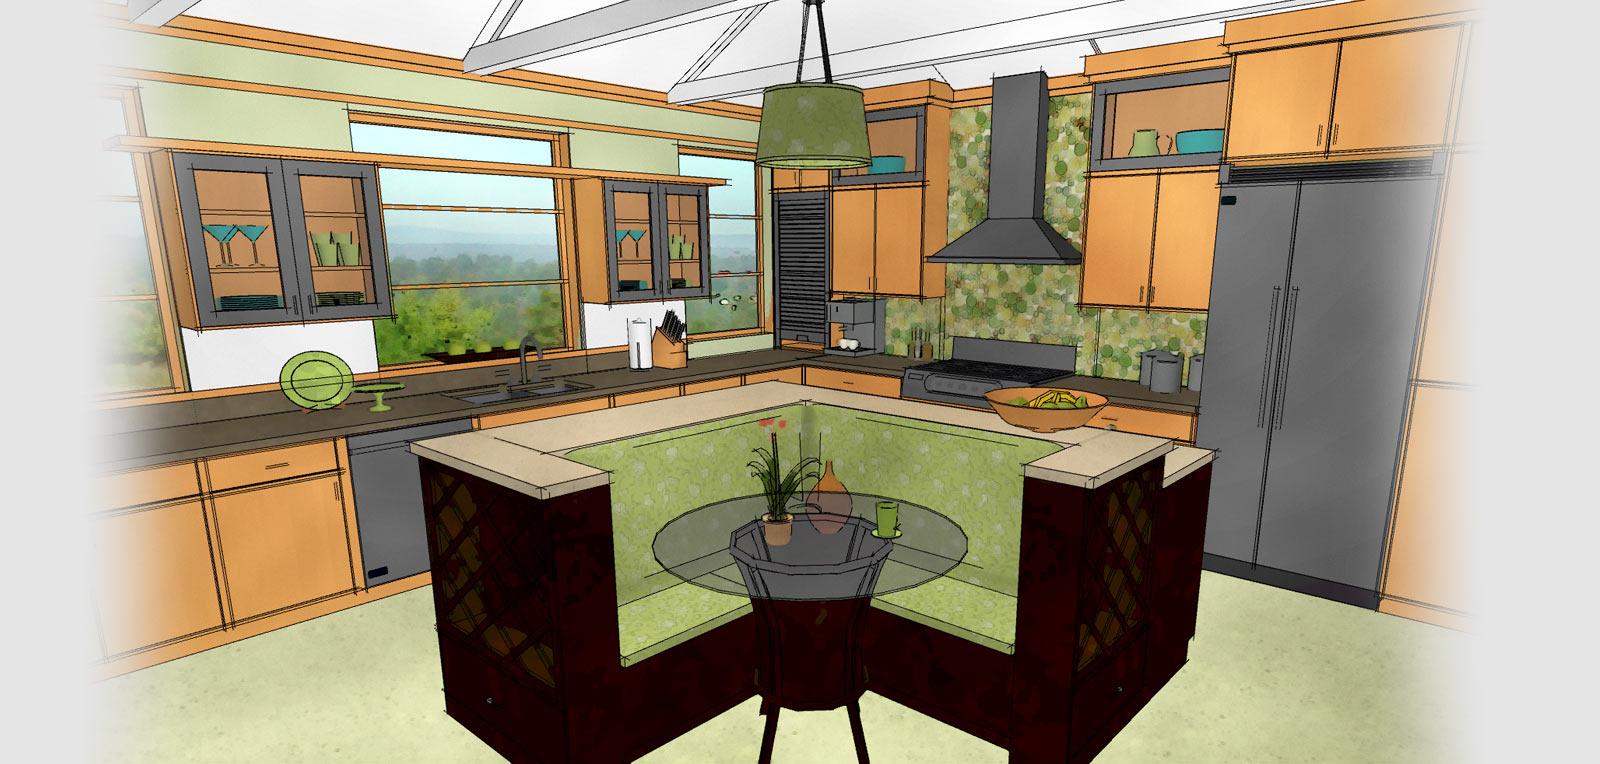 cabinet designer tools cabinet software design tools choose home kitchen design display interior exterior plan